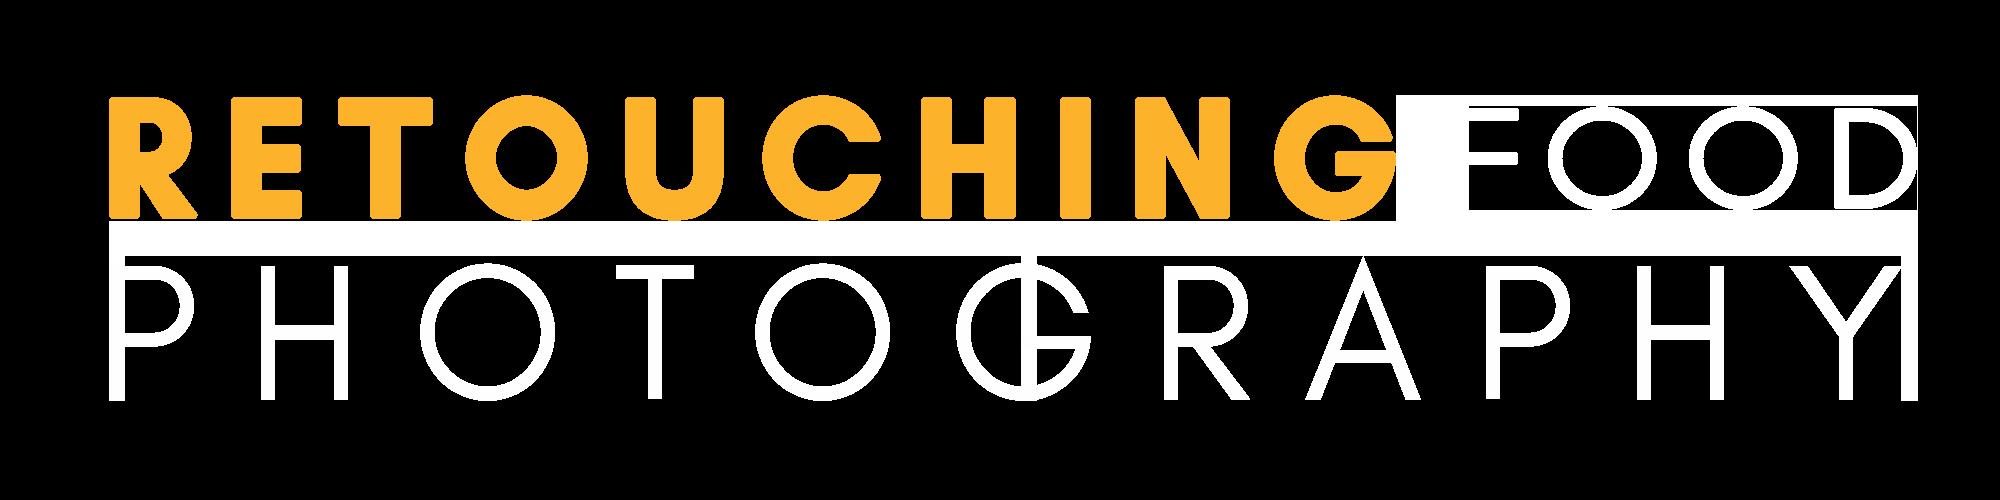 RetouchingFoodPhotography-logo-yw.png